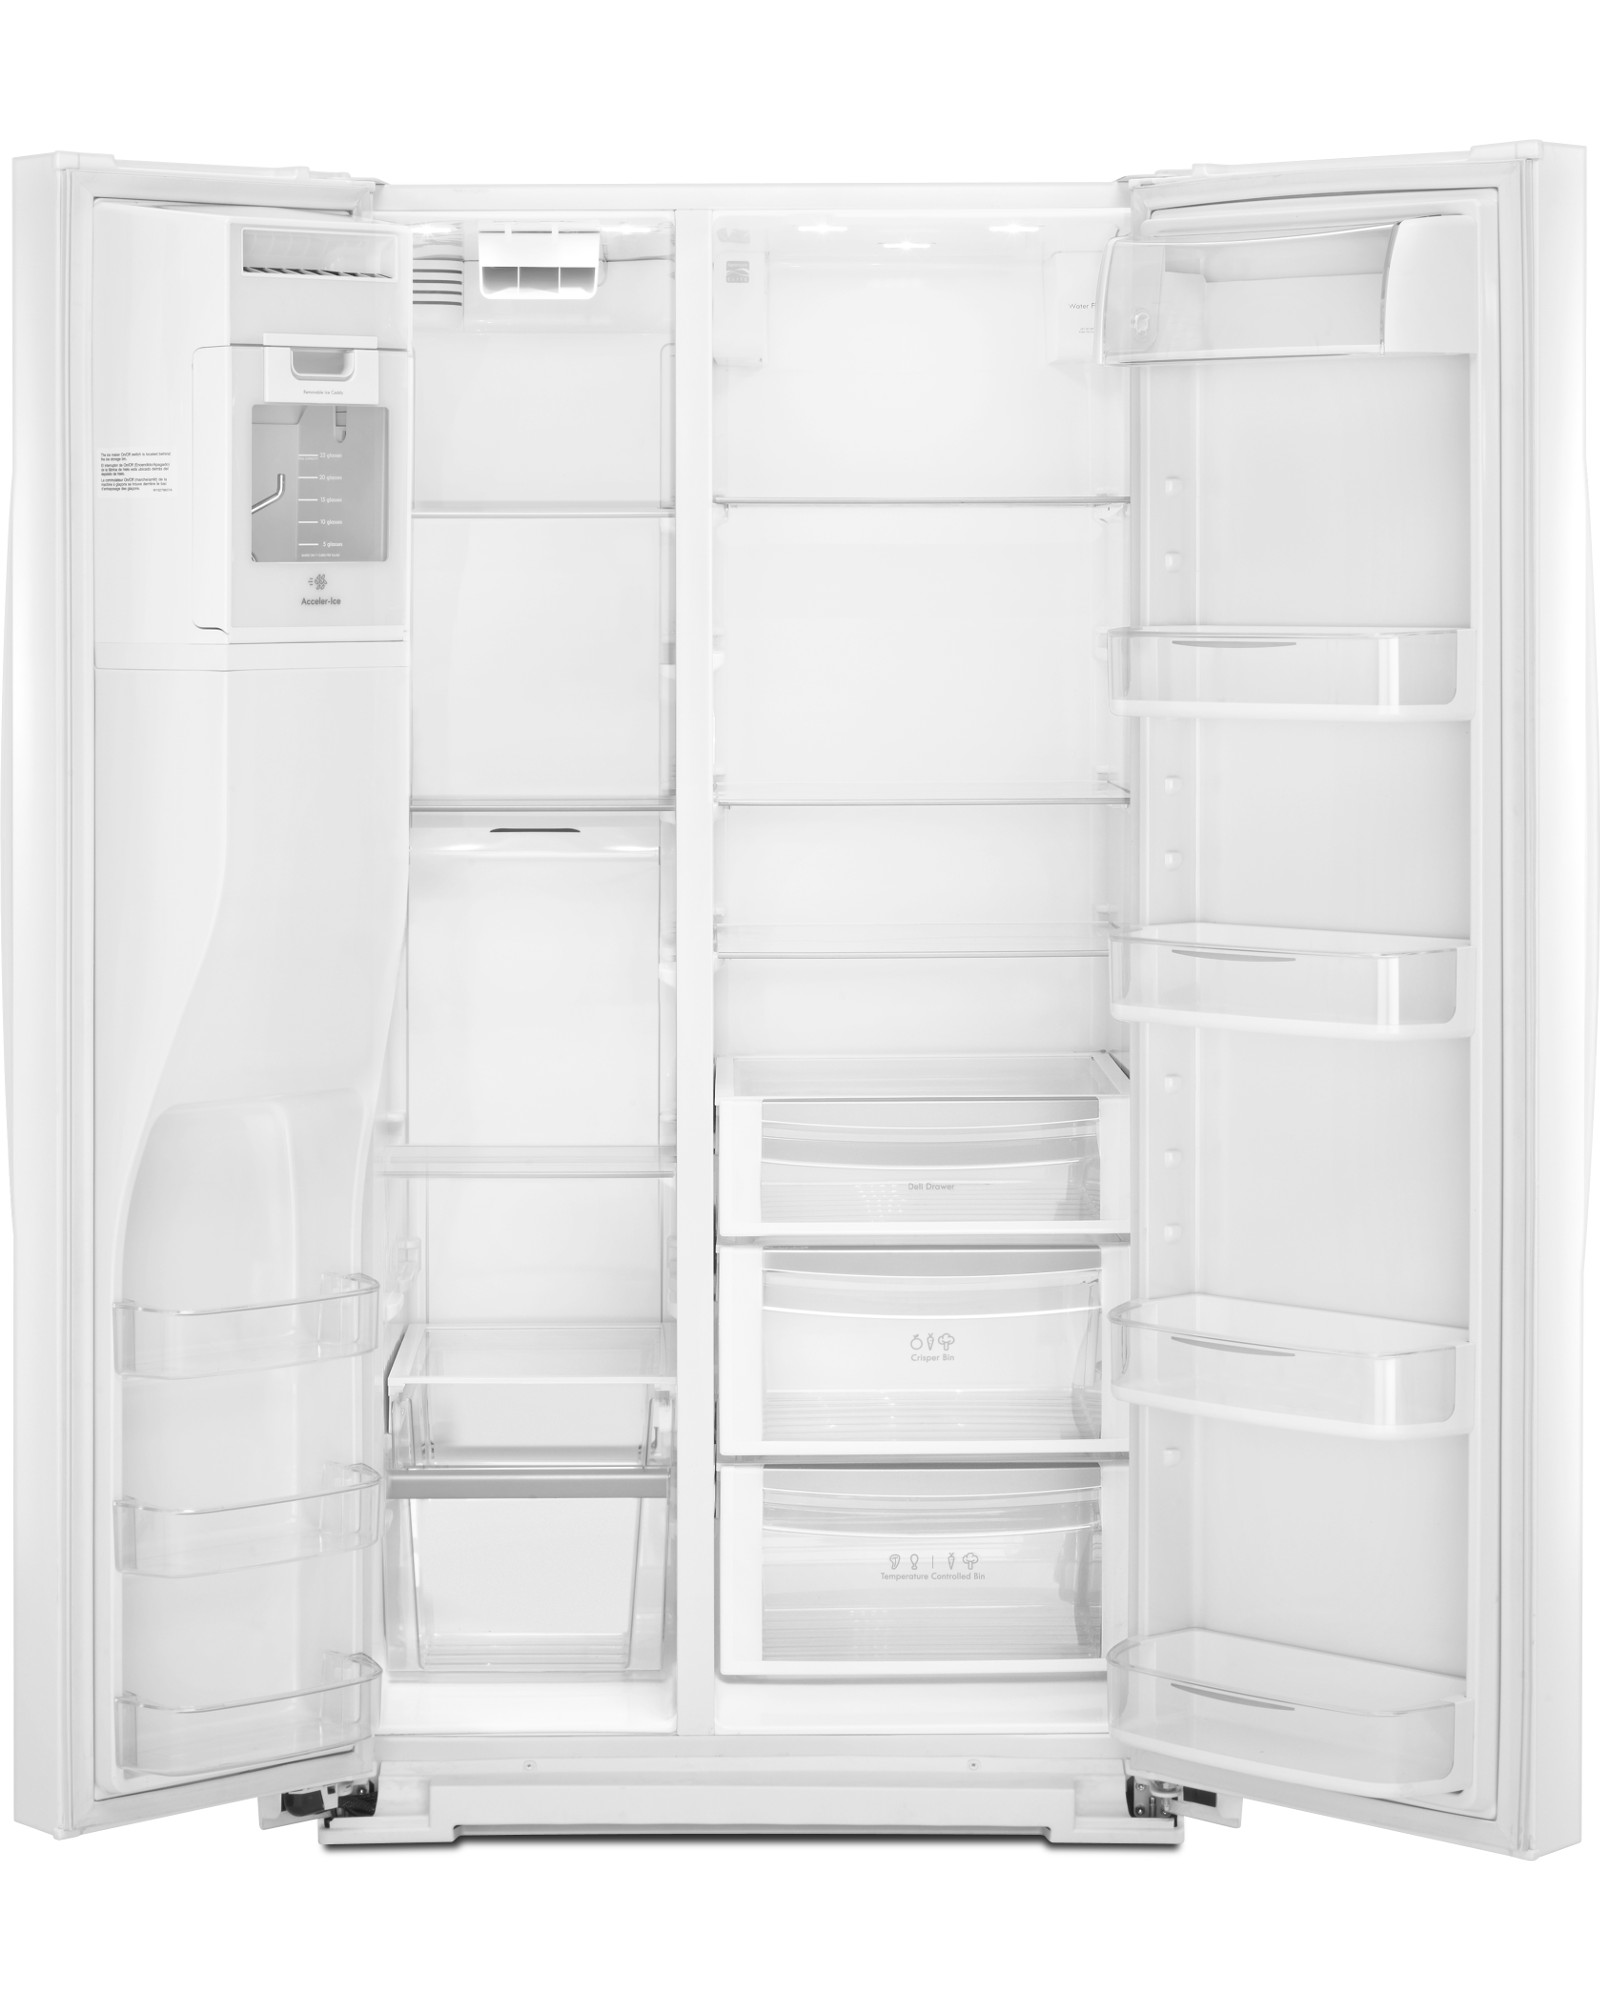 Kenmore Elite 51712 23 cu. ft. Counter-Depth Side-by-Side Refrigerator w/ SmartSense™ - White